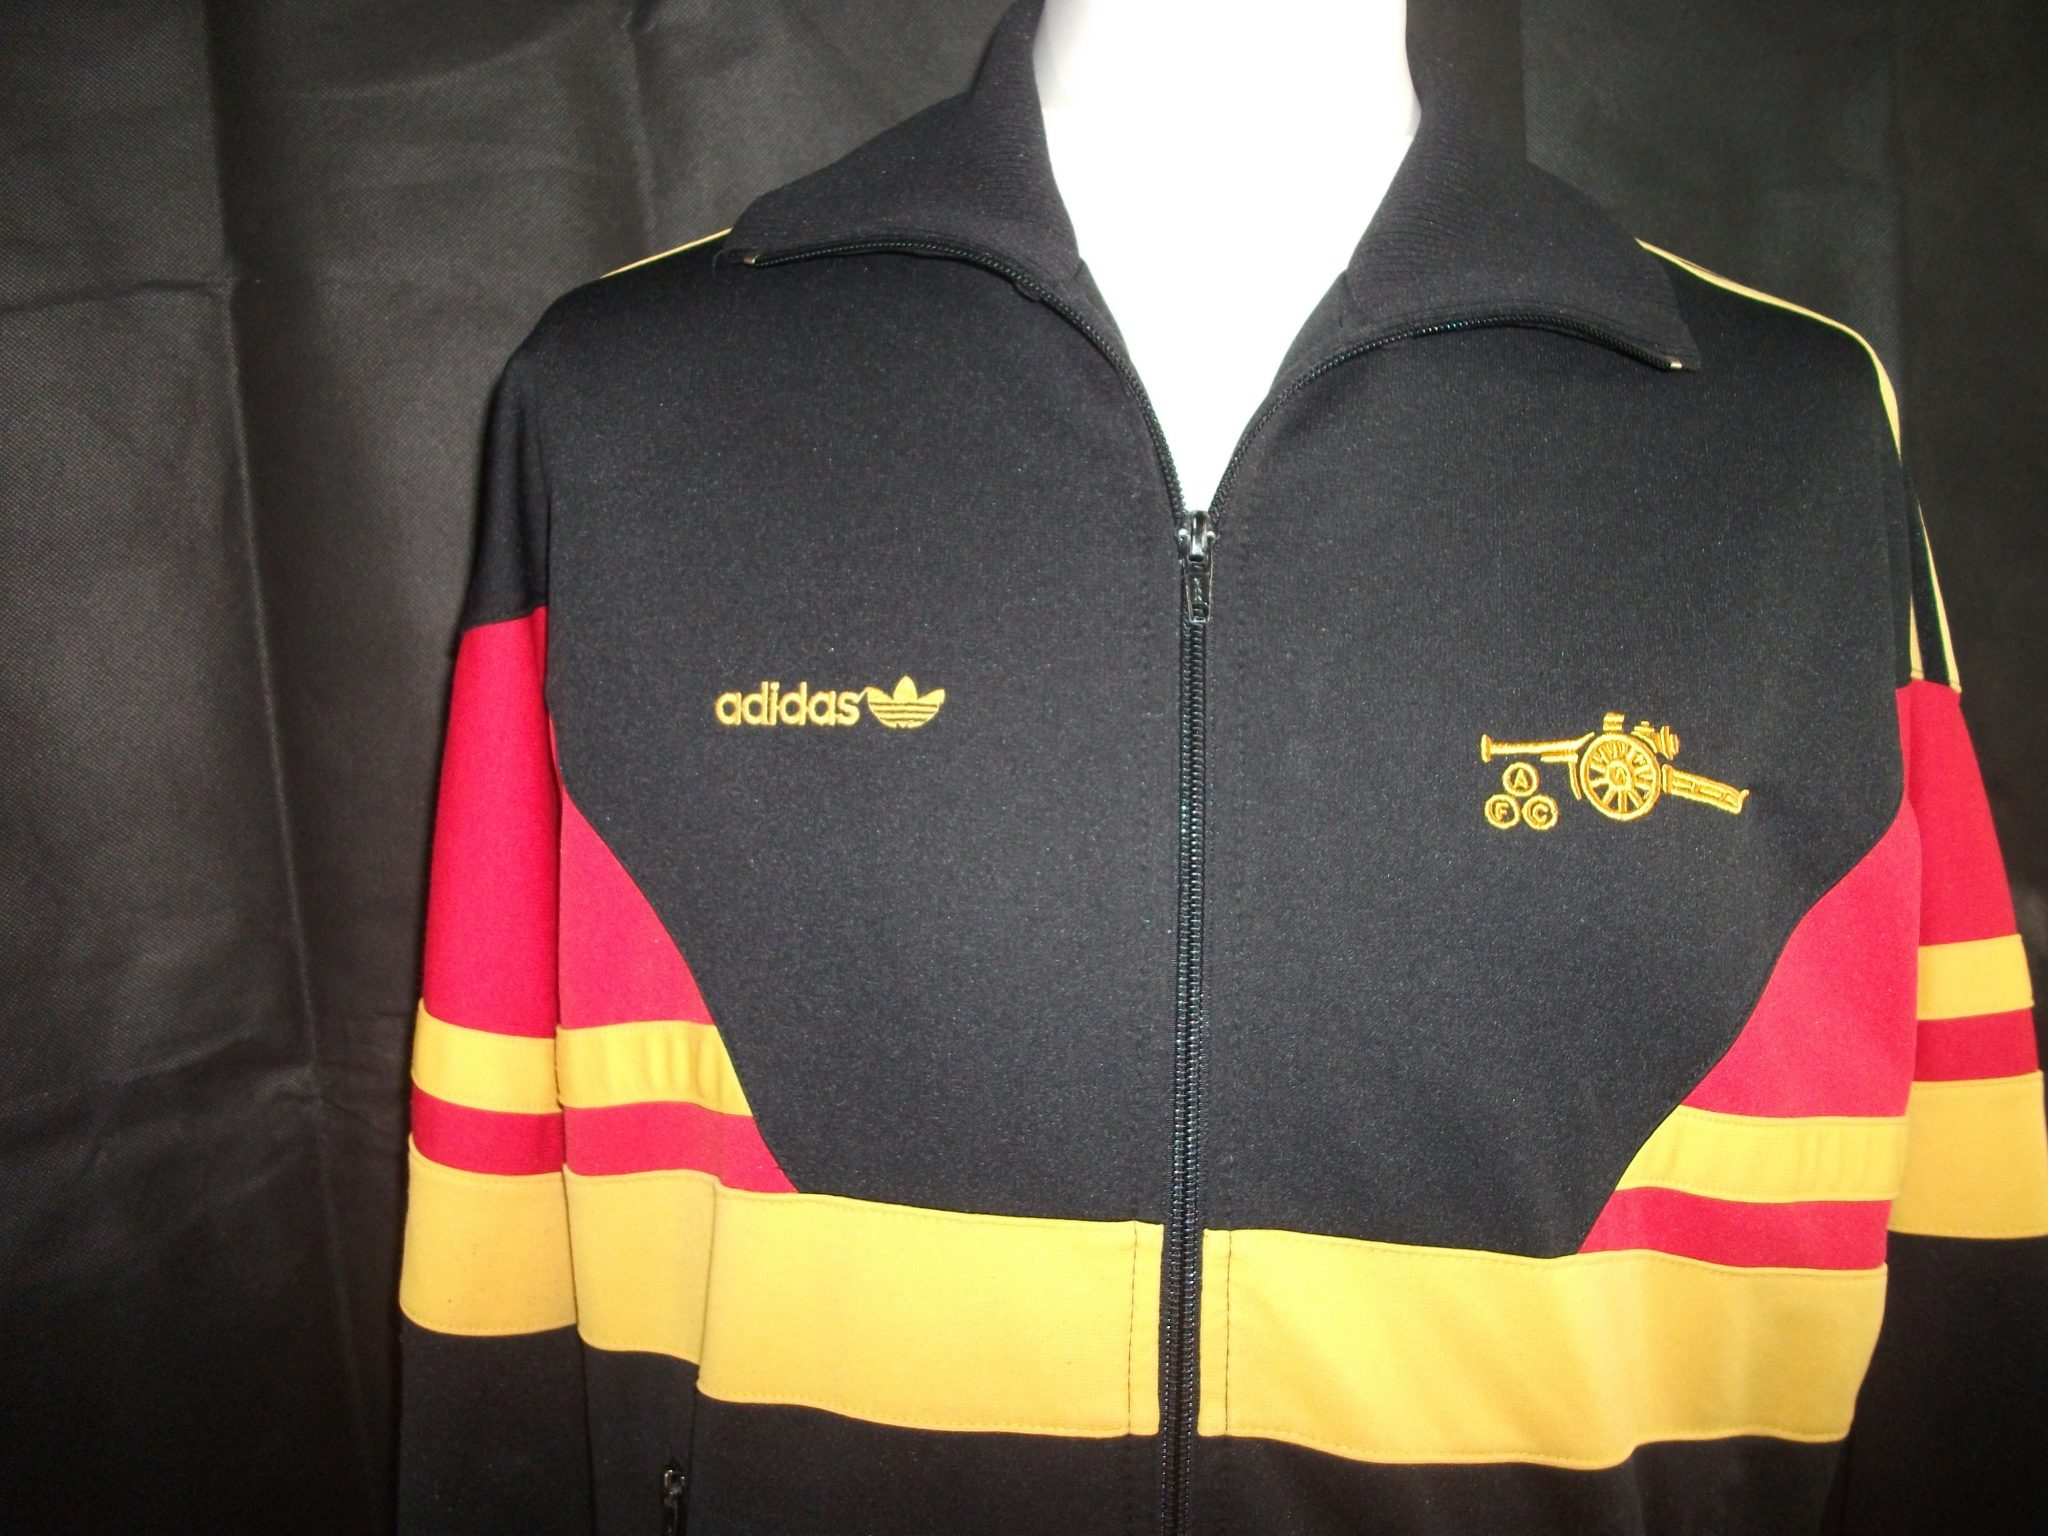 Vintage Adidas 1980 S Arsenal Track Jacket 2 On The Ball